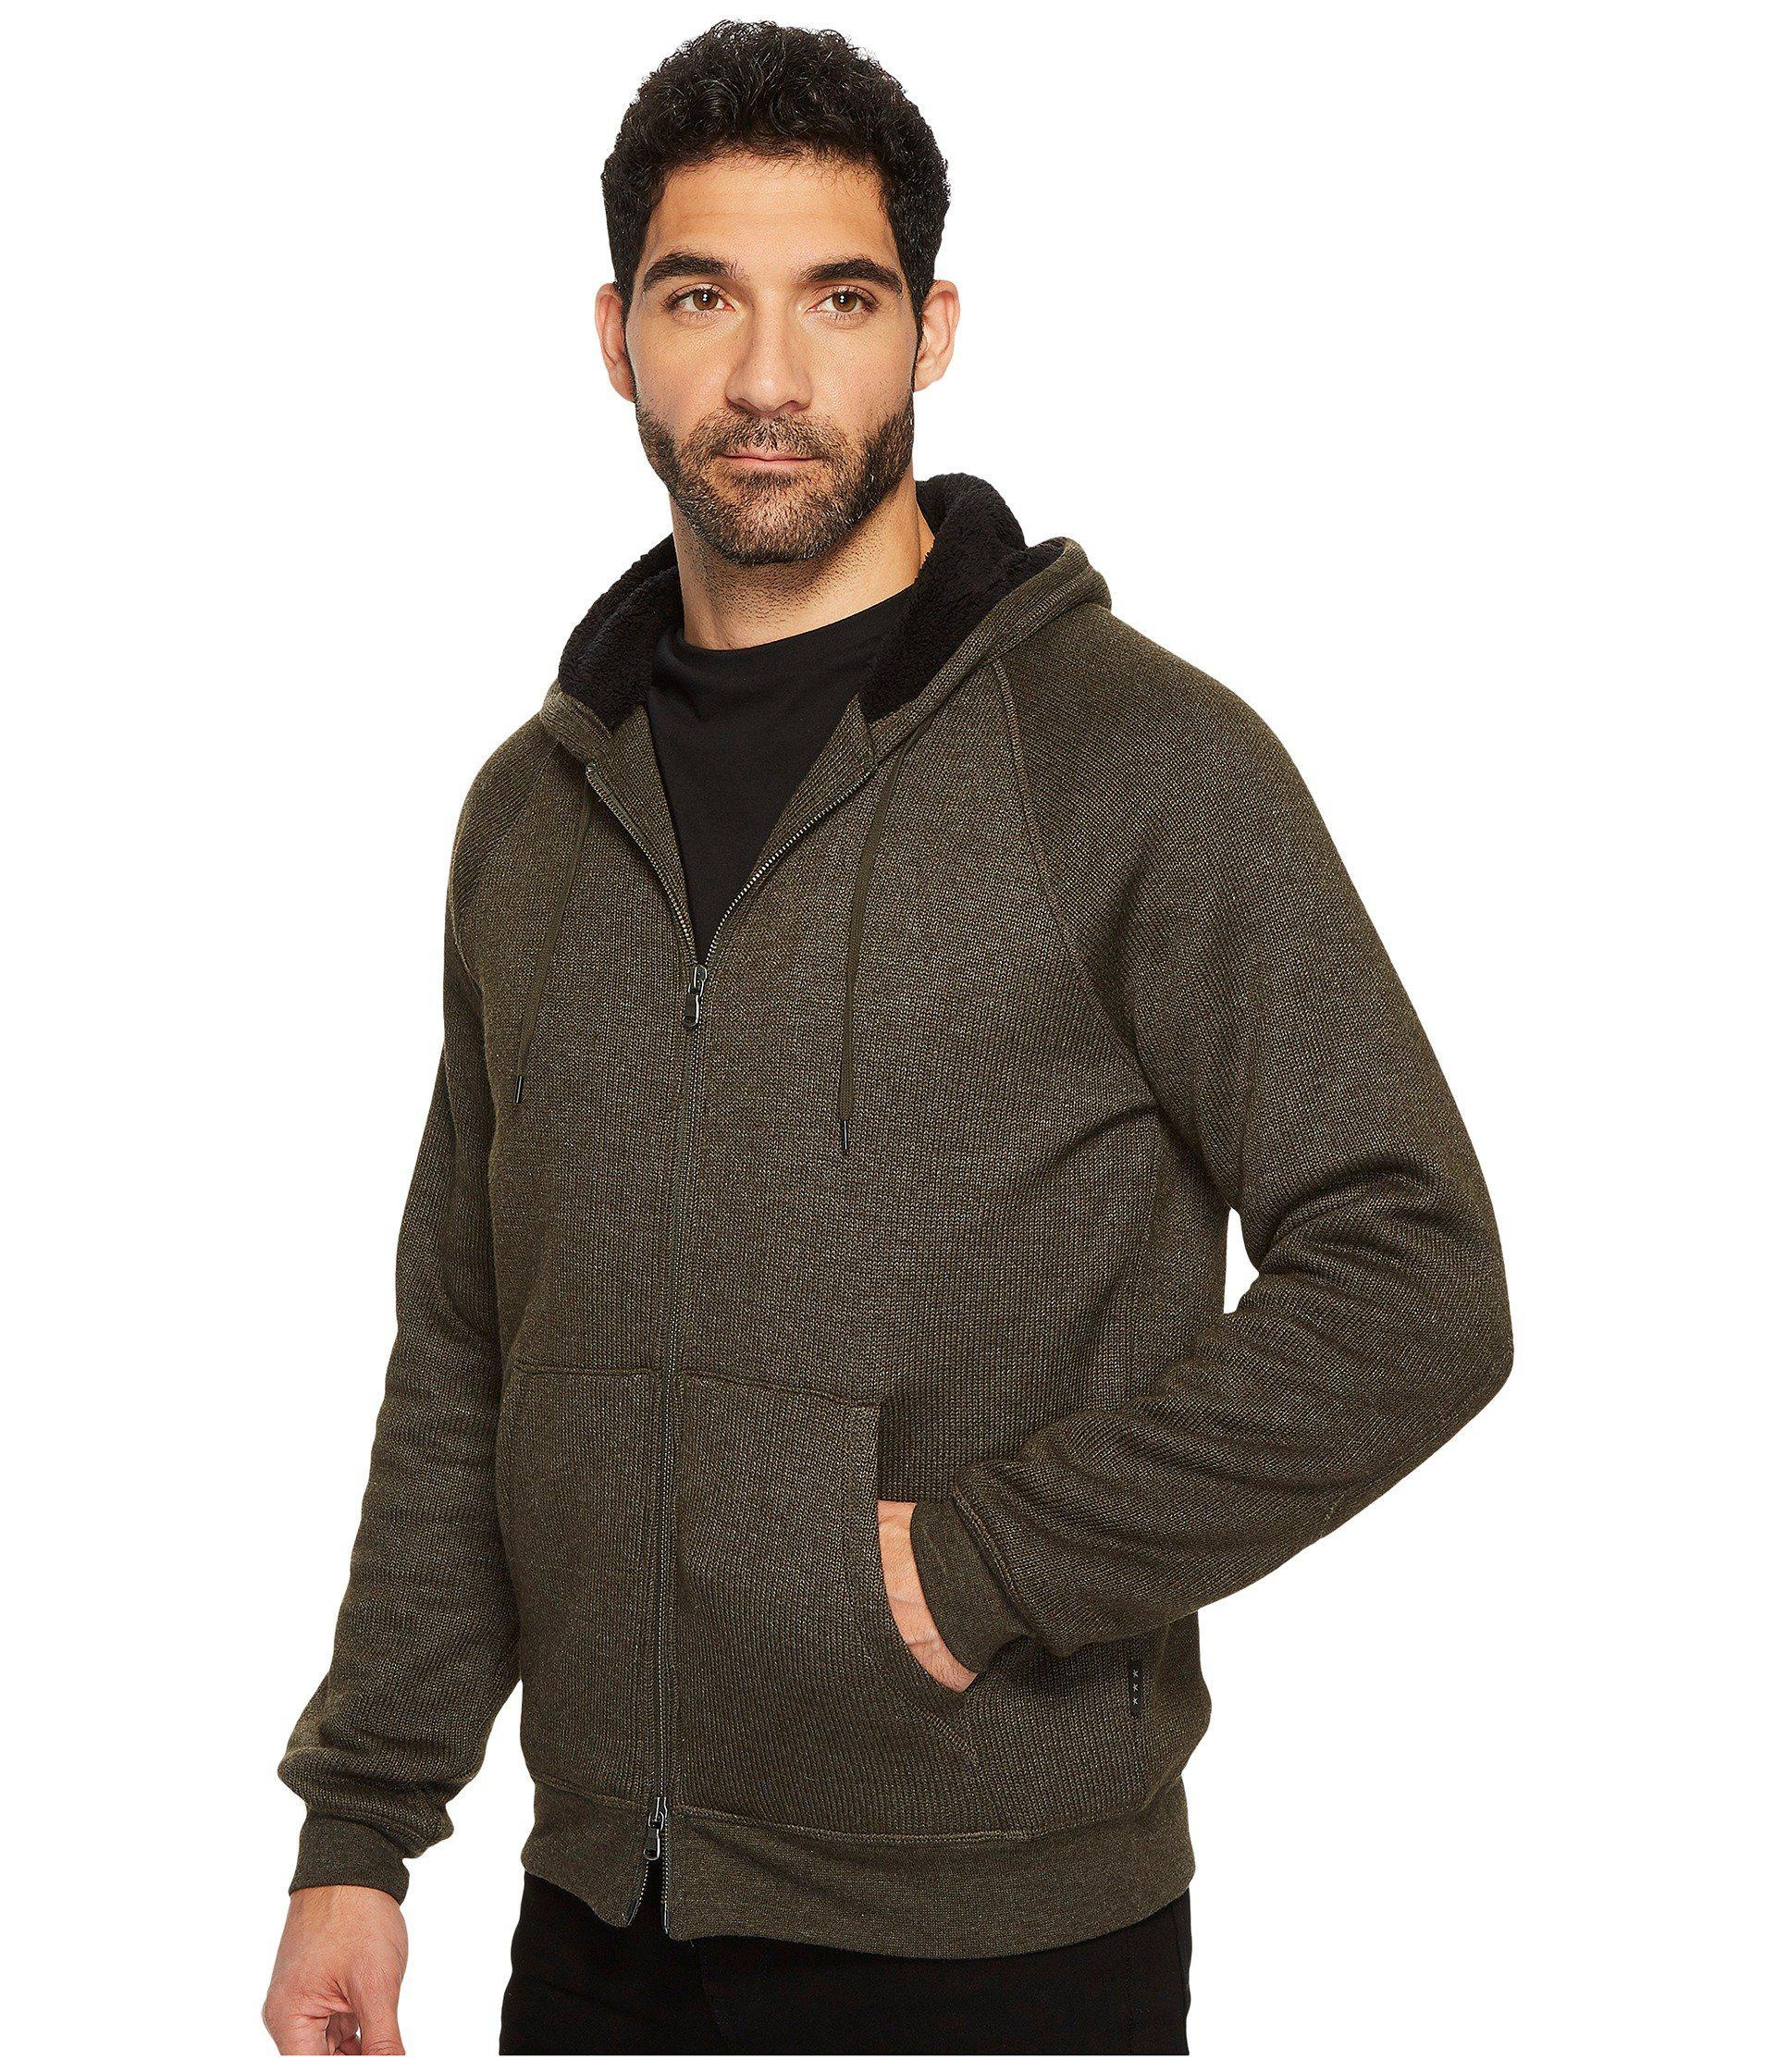 John Varvatos Star USA Men/'s Olive Branch Green Fleece Lined Zip Hooded Jacket